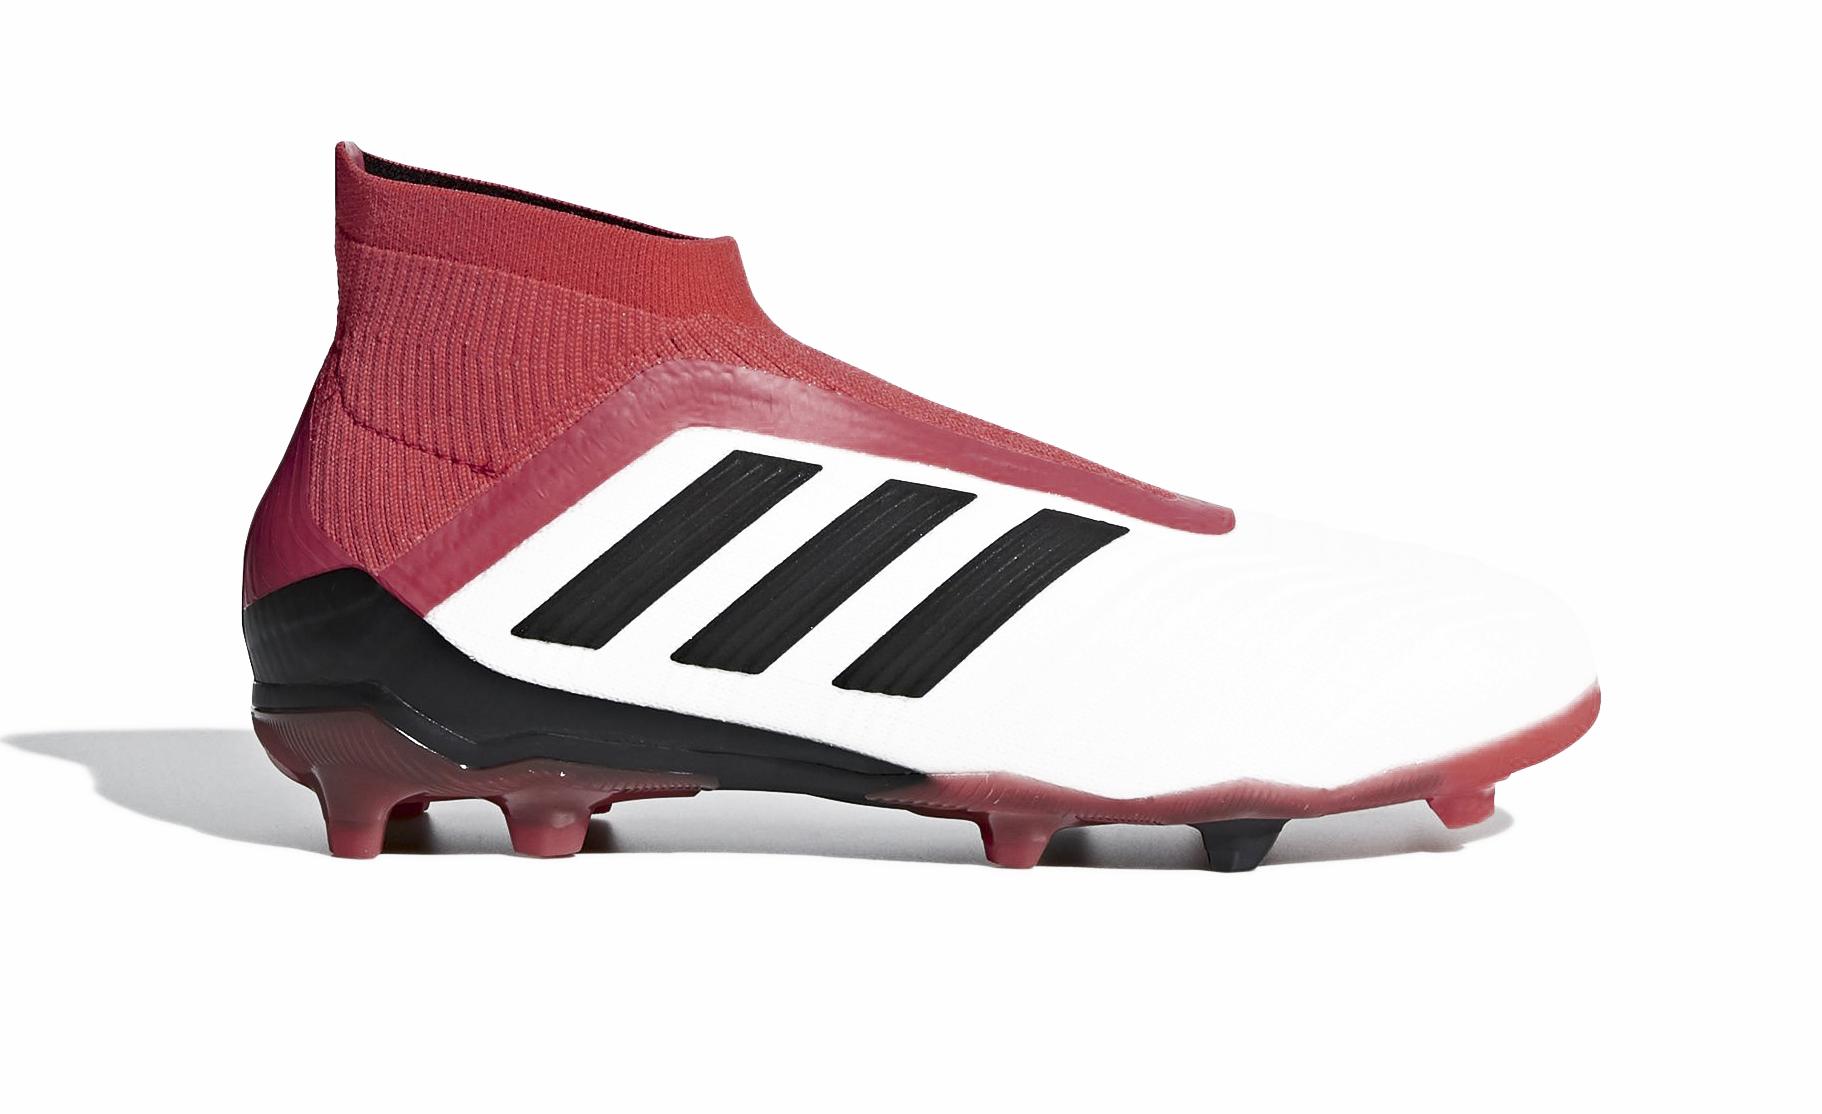 Acquista 2 OFF QUALSIASI scarpe calcetto adidas predator